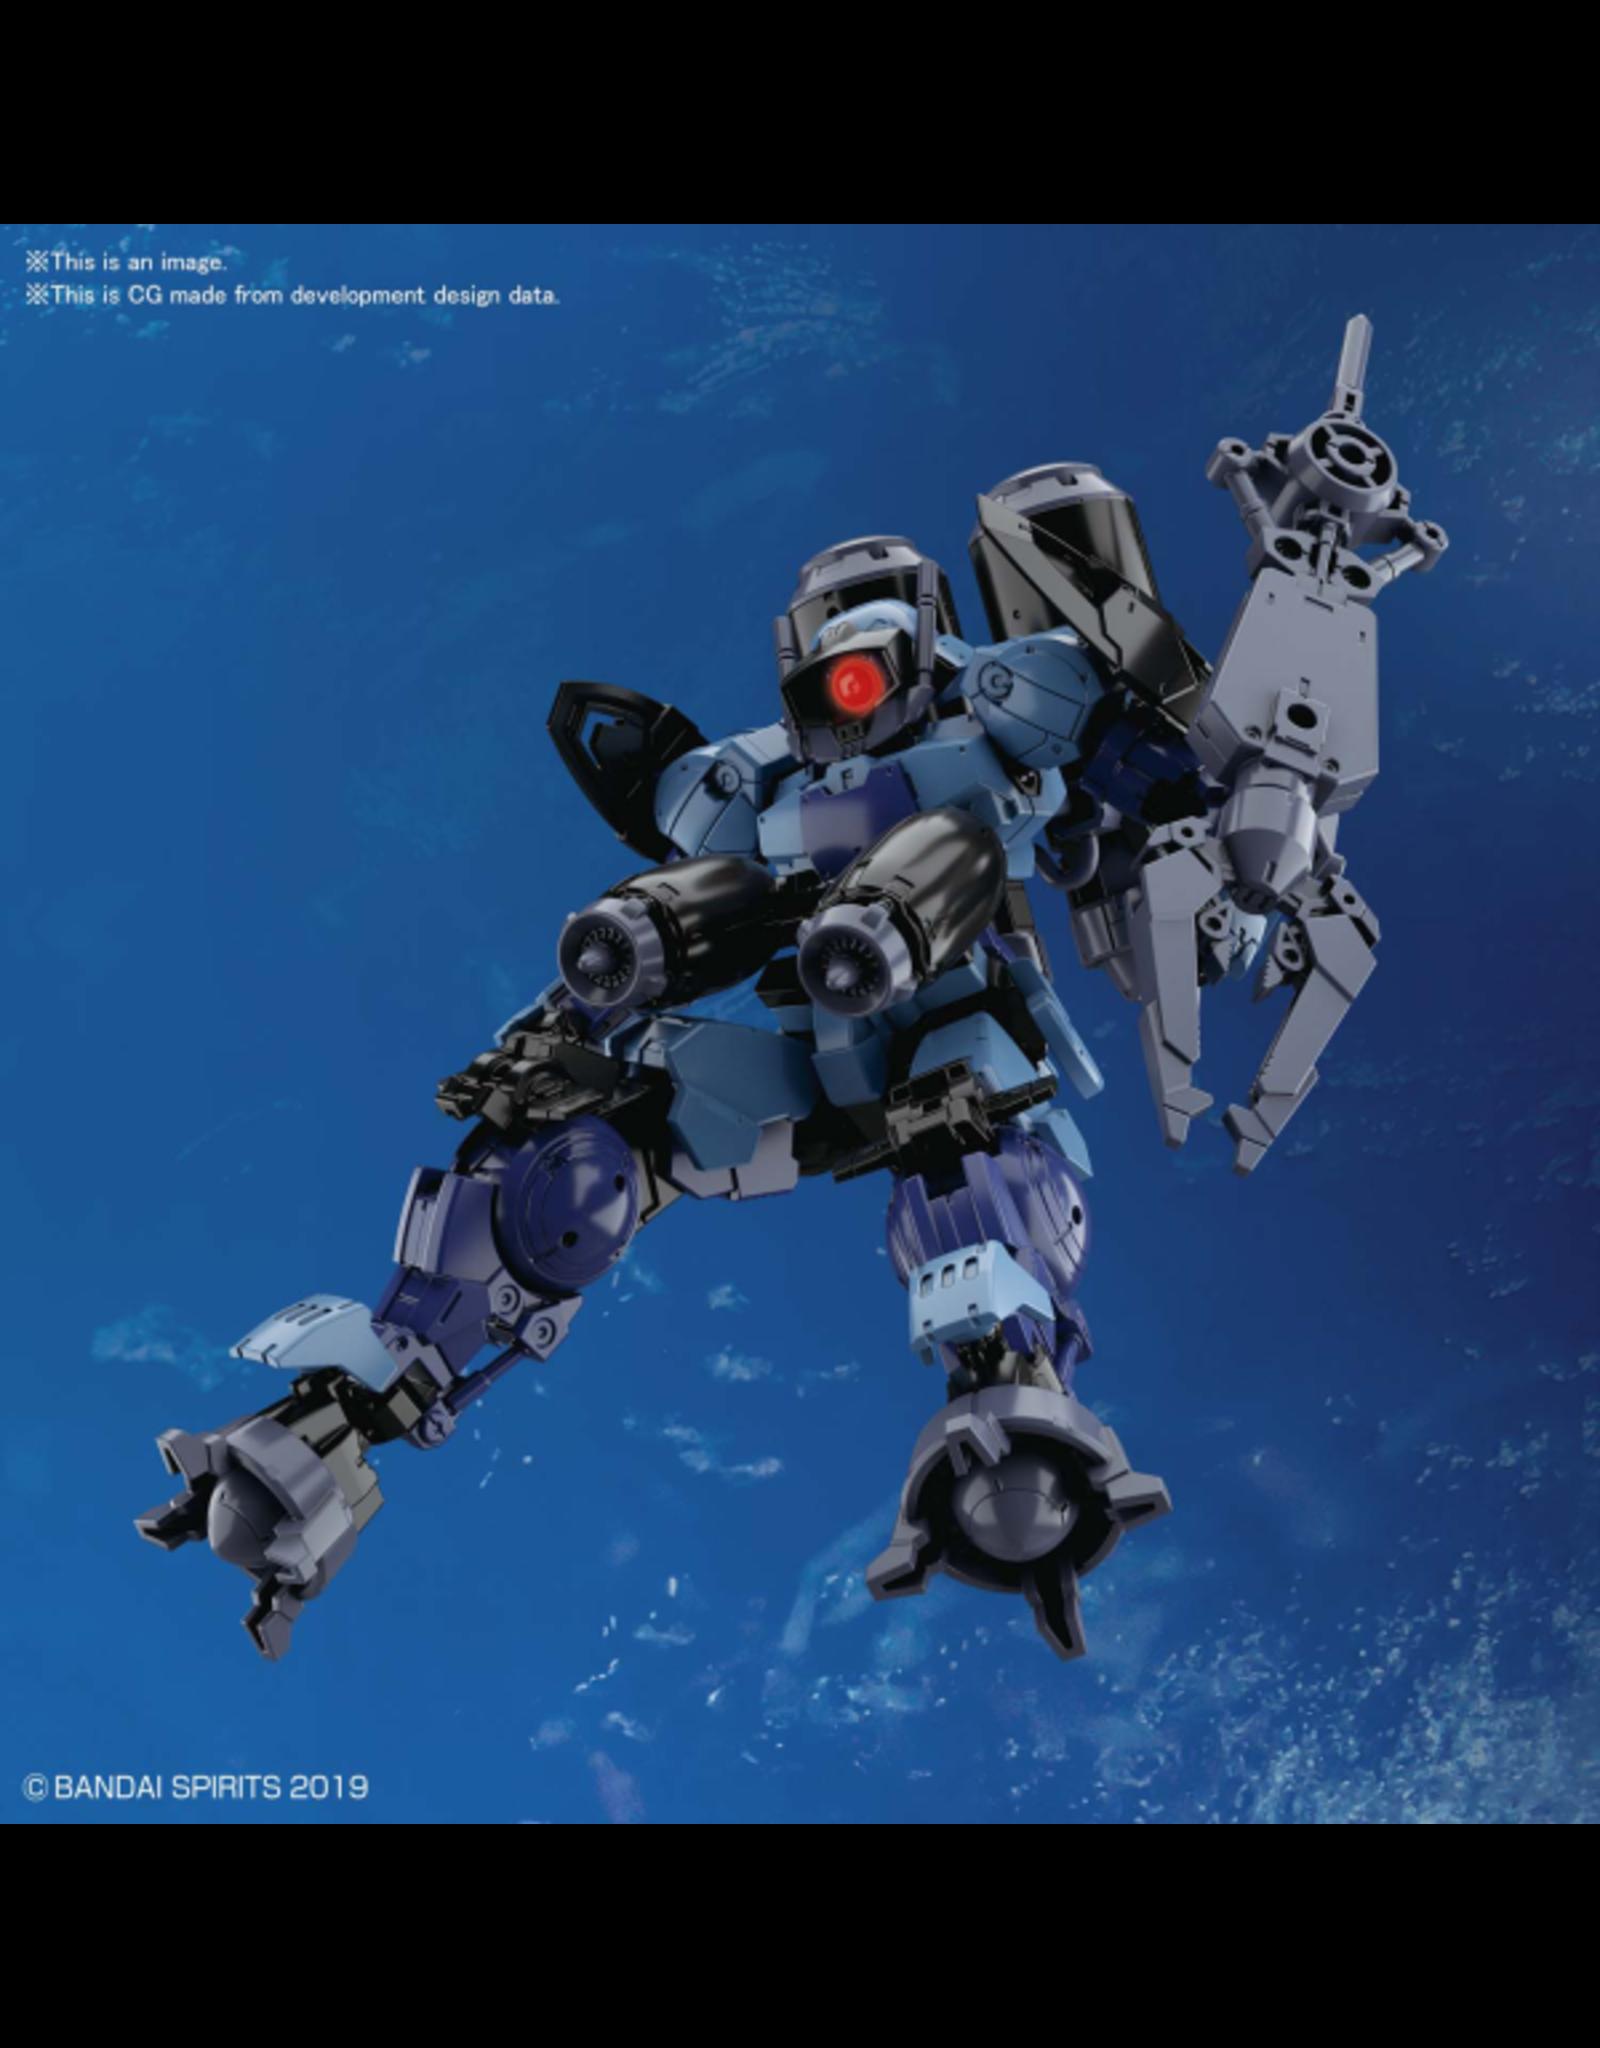 BANDAI 30MM 1/144 bEXM-15 PORTANOVA (MARINE TYPE) [BLUE GRAY]